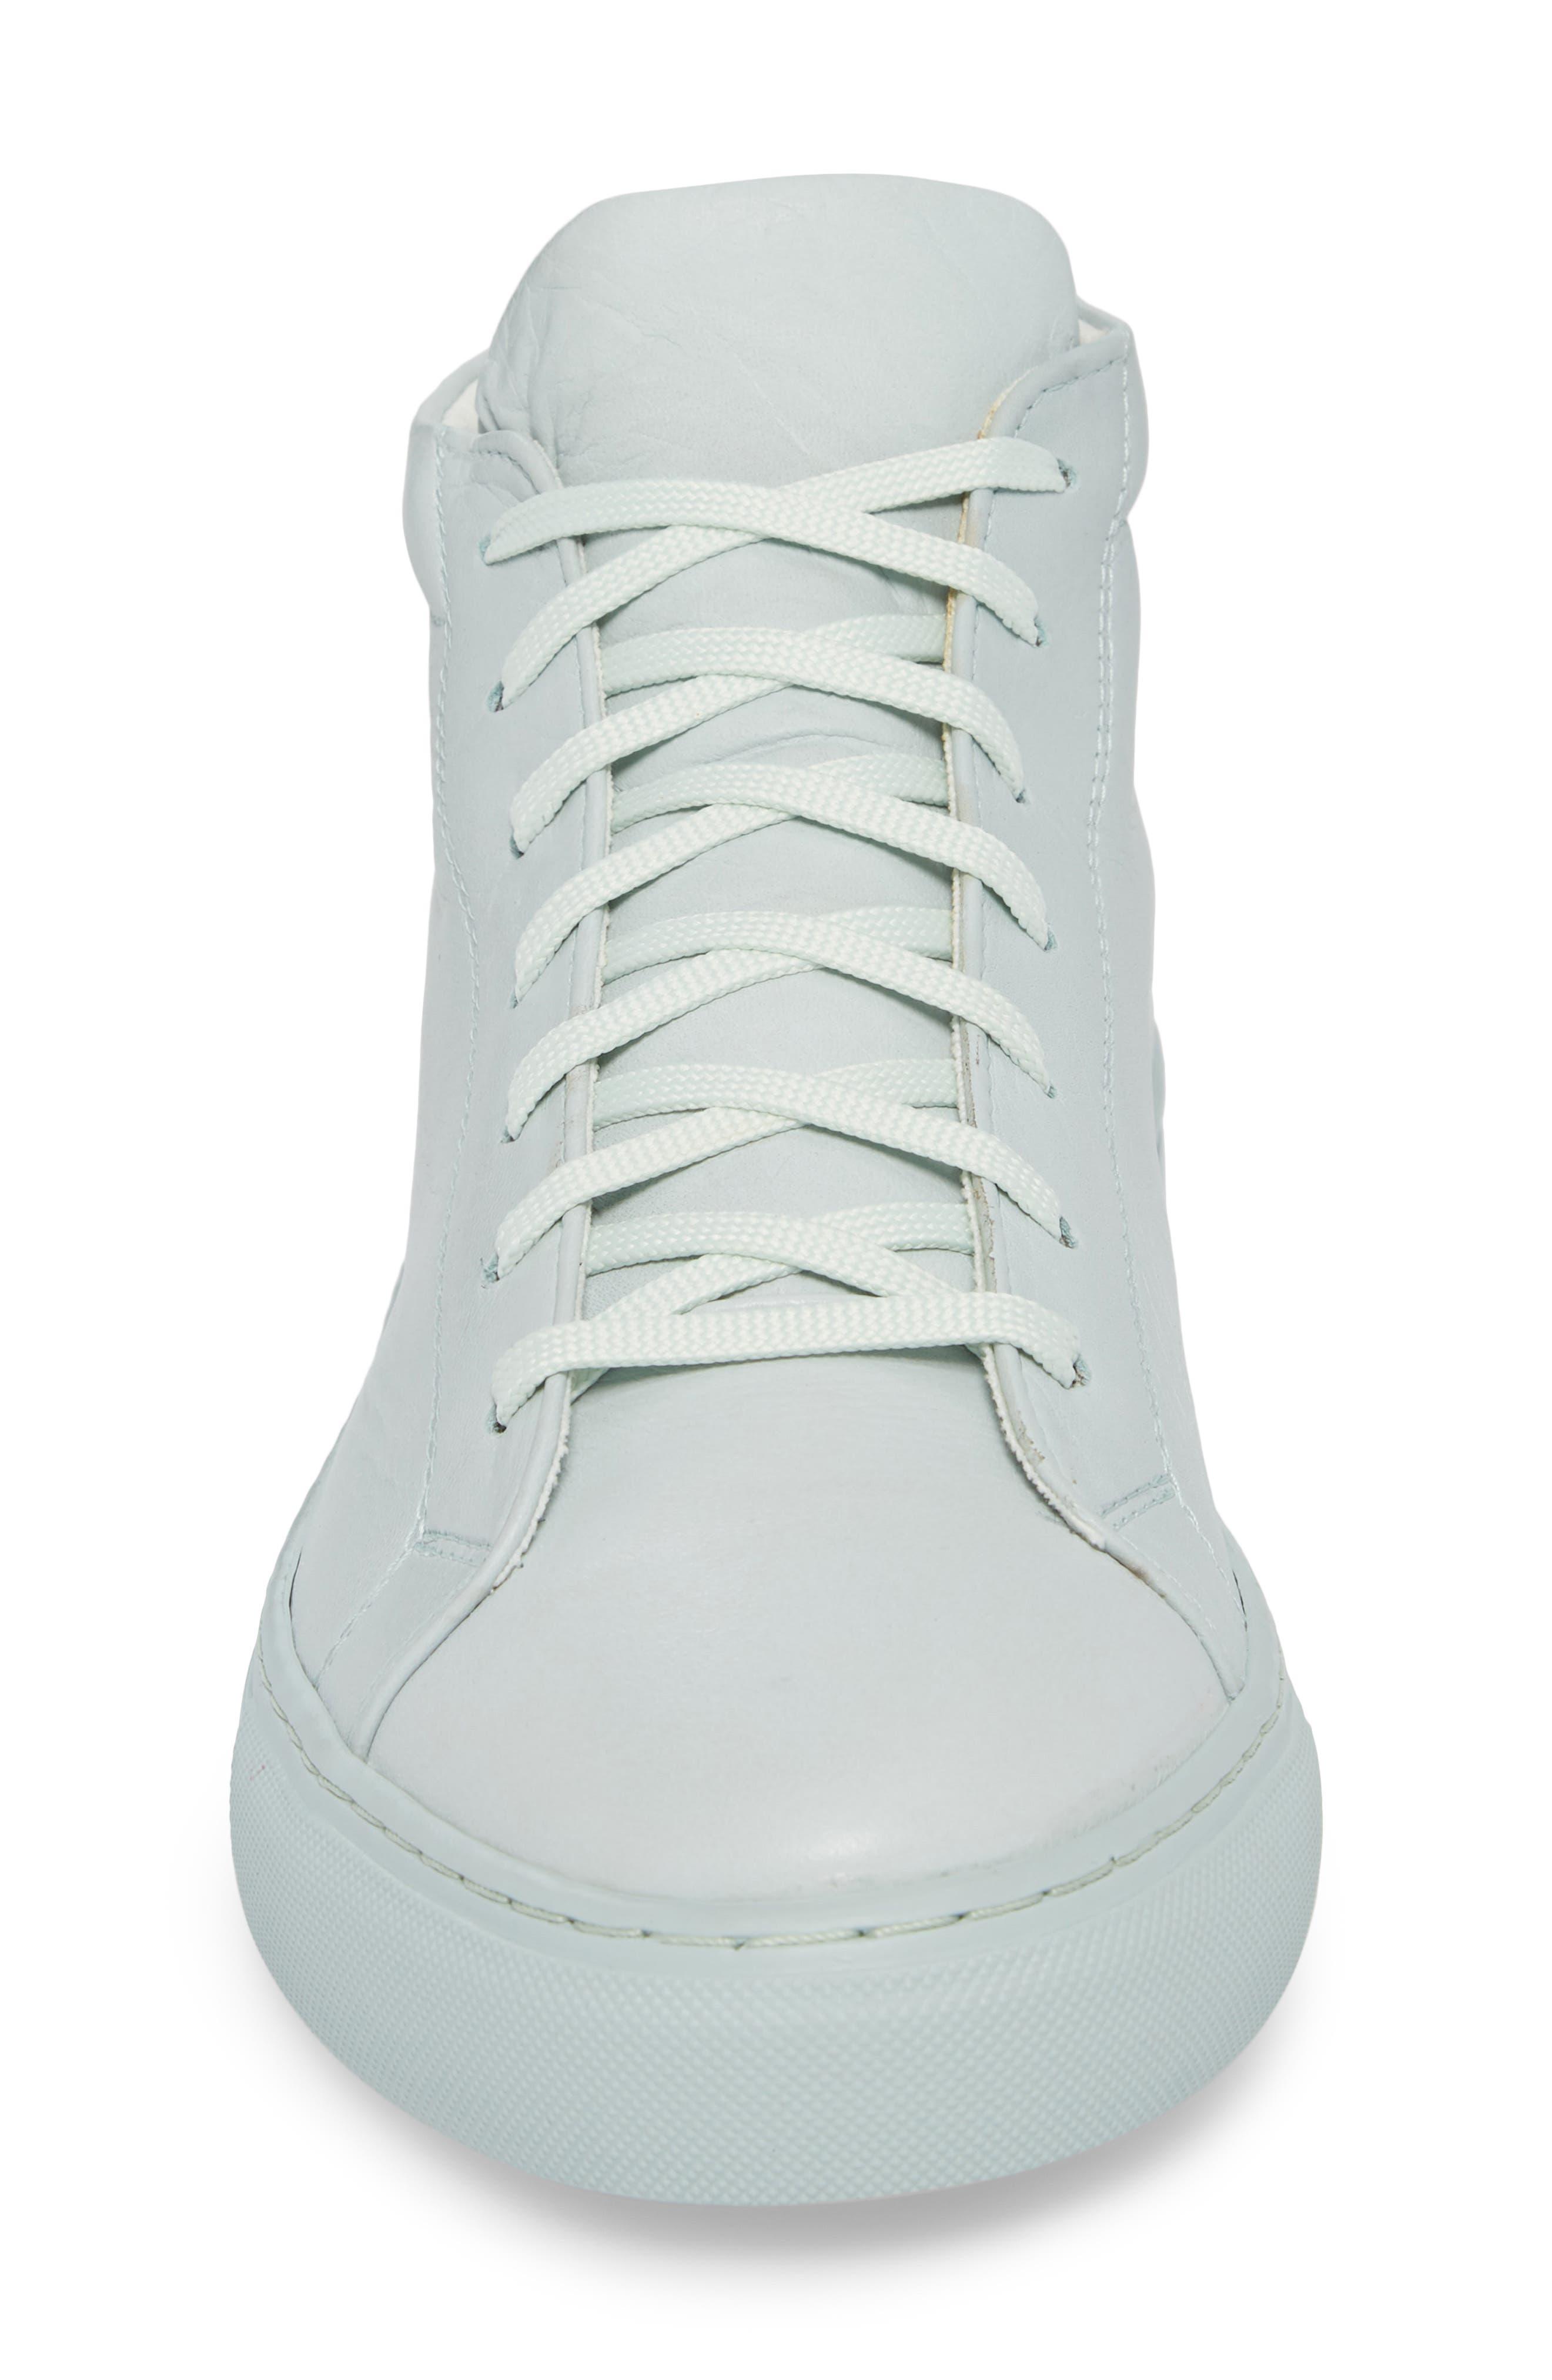 Lexington Mid Top Sneaker,                             Alternate thumbnail 10, color,